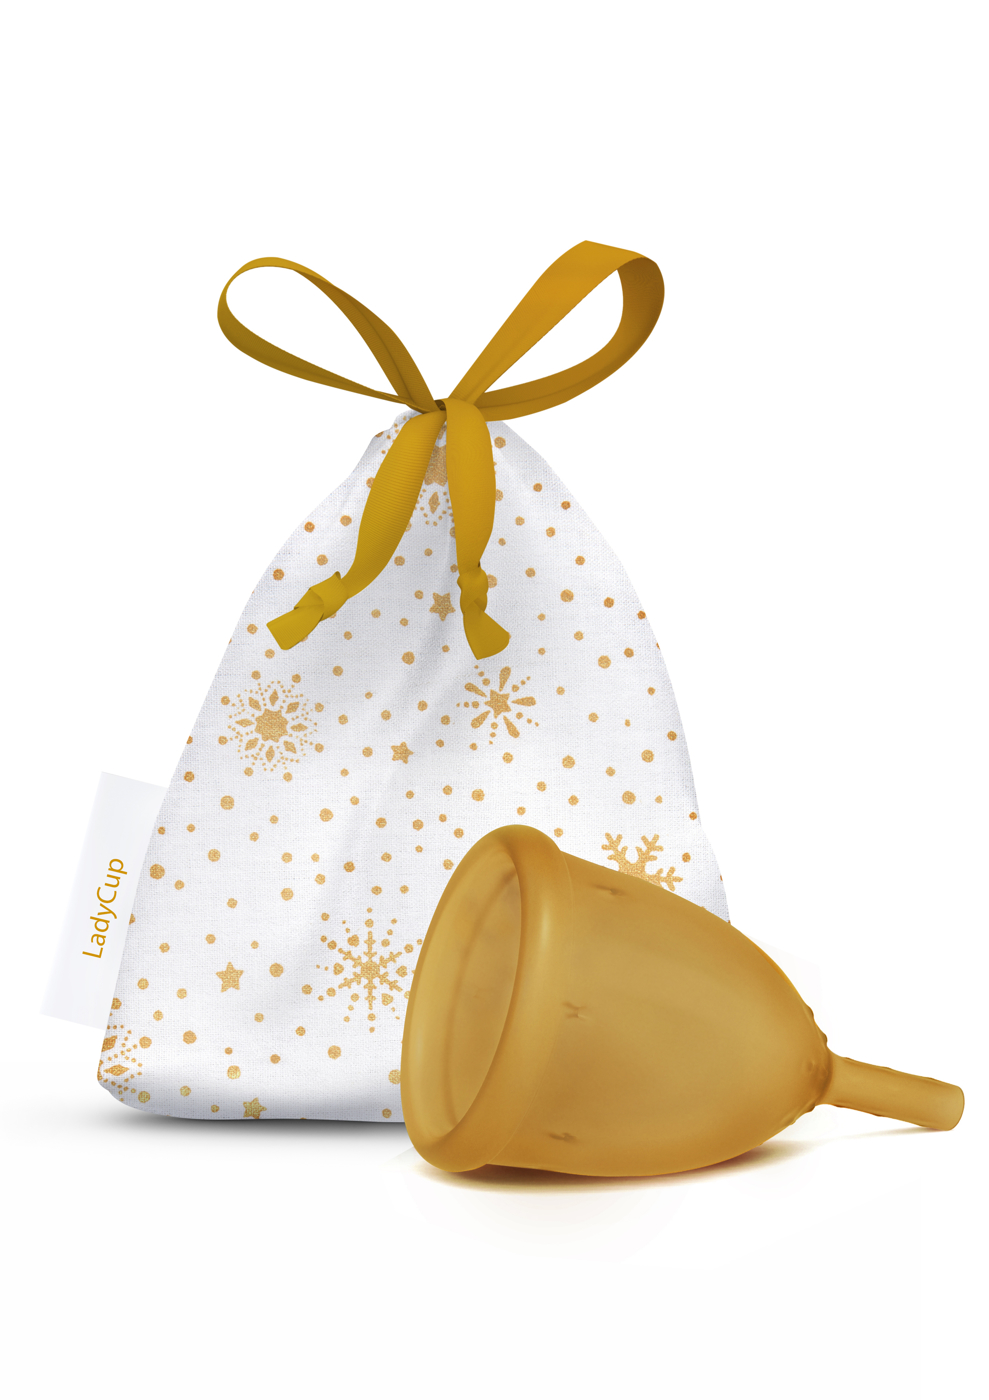 ladycup-menskopp-gold